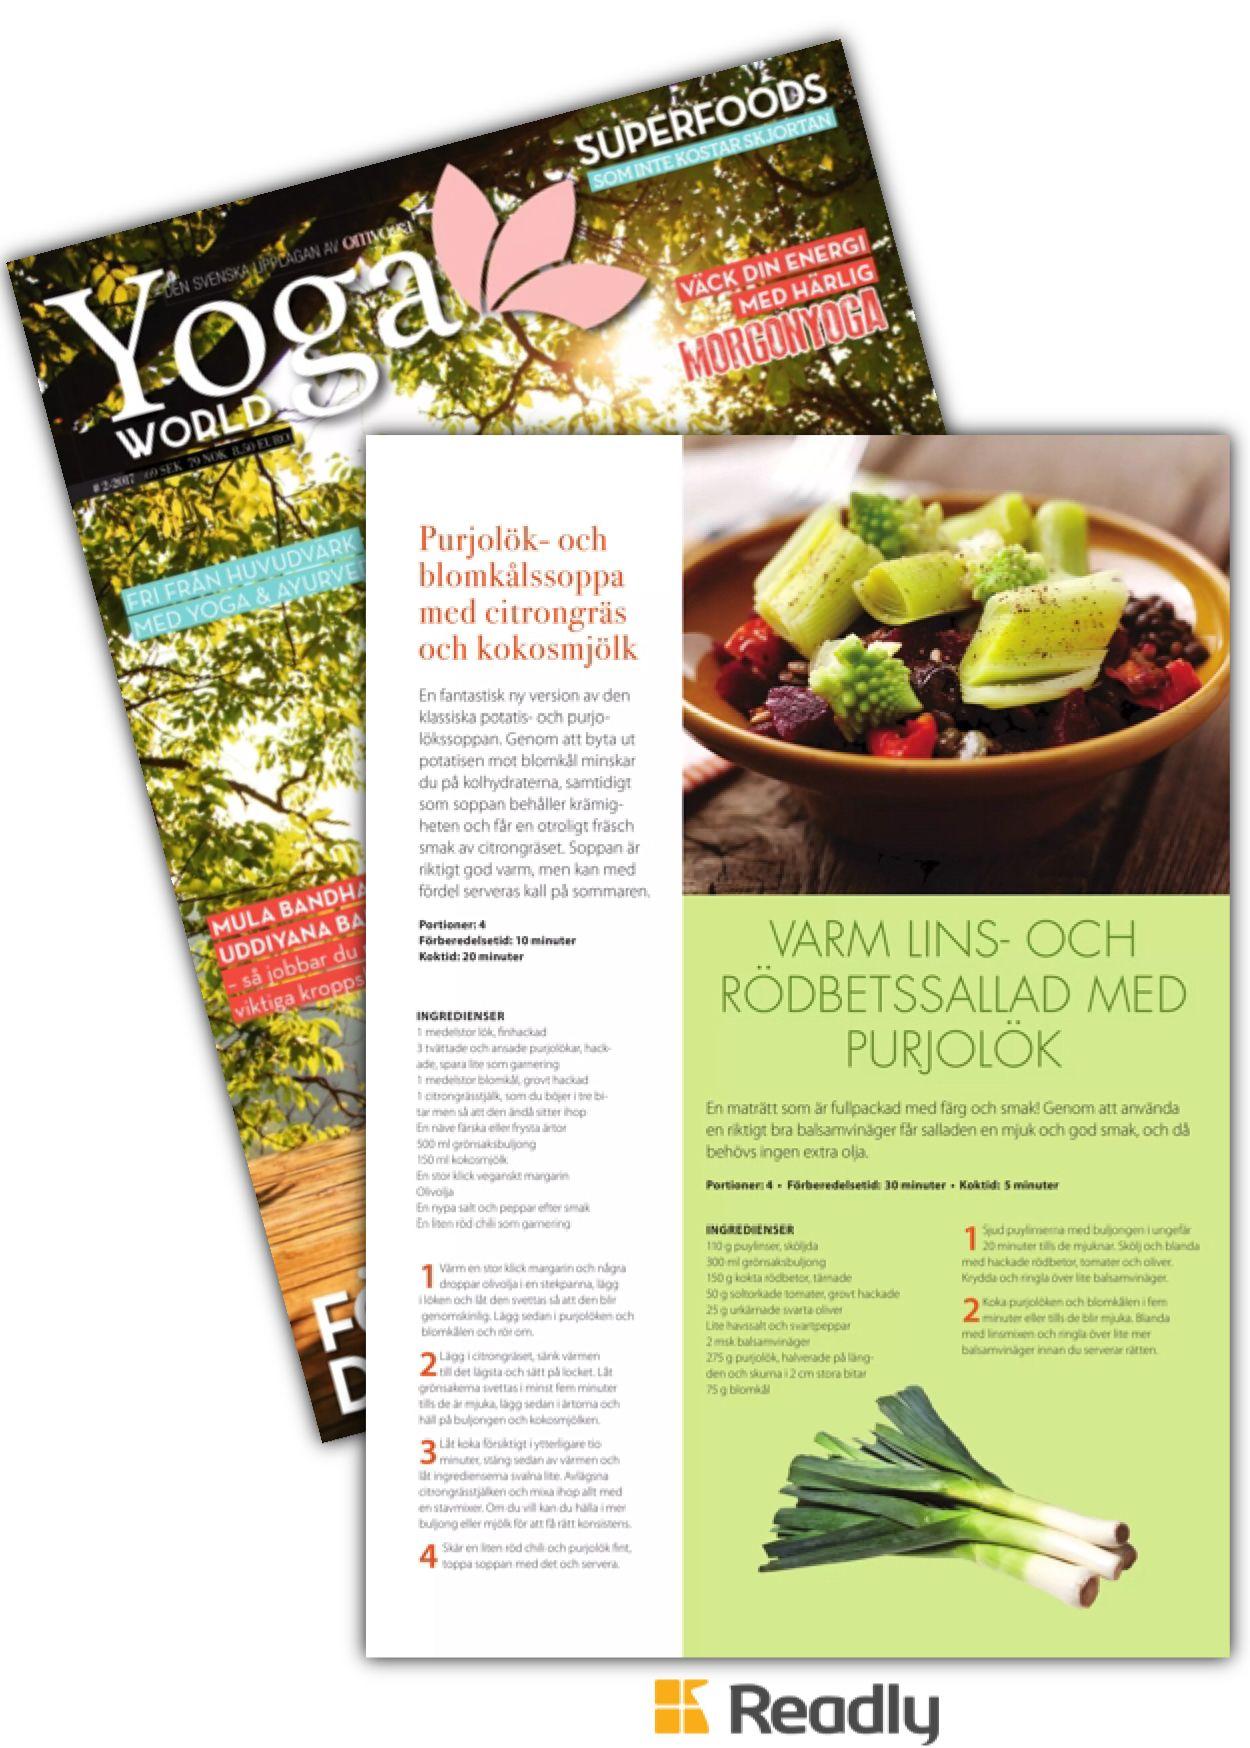 Tips om Yoga World 4 april 2017 sidan 39